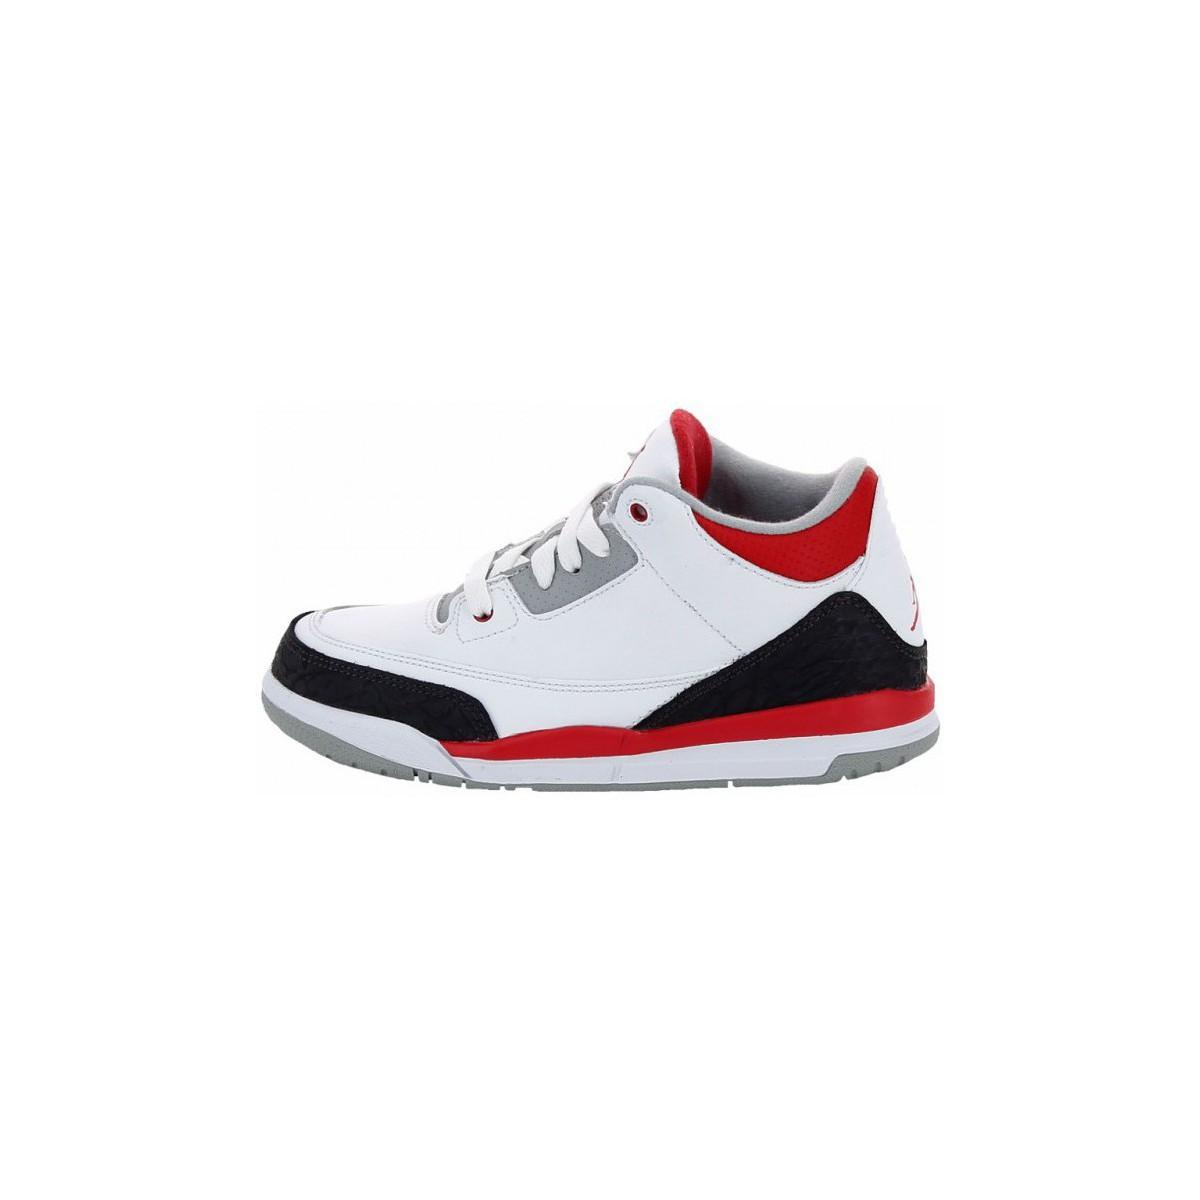 Baskets montantes Nike Air Jordan 3 Retro Cadet Blanc - Livraison Gratuite avec Spartoo.com ! - Chaussures Enfant 63,14 €